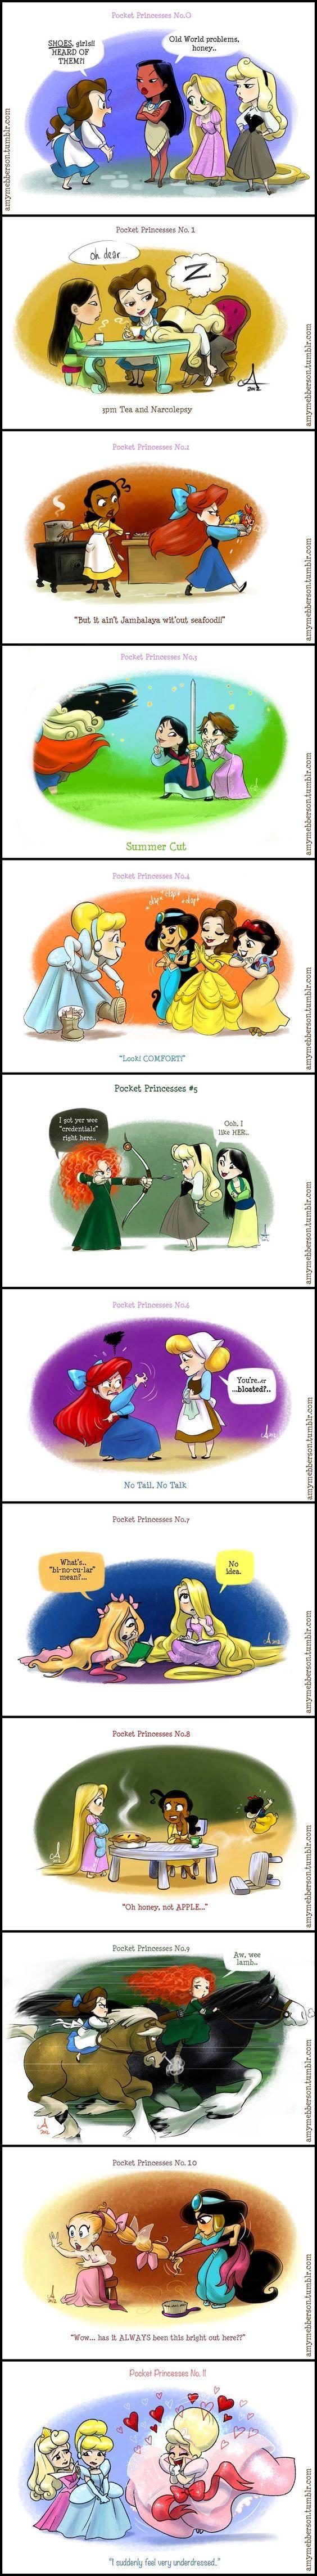 Pocket princess 0-11 - Funny